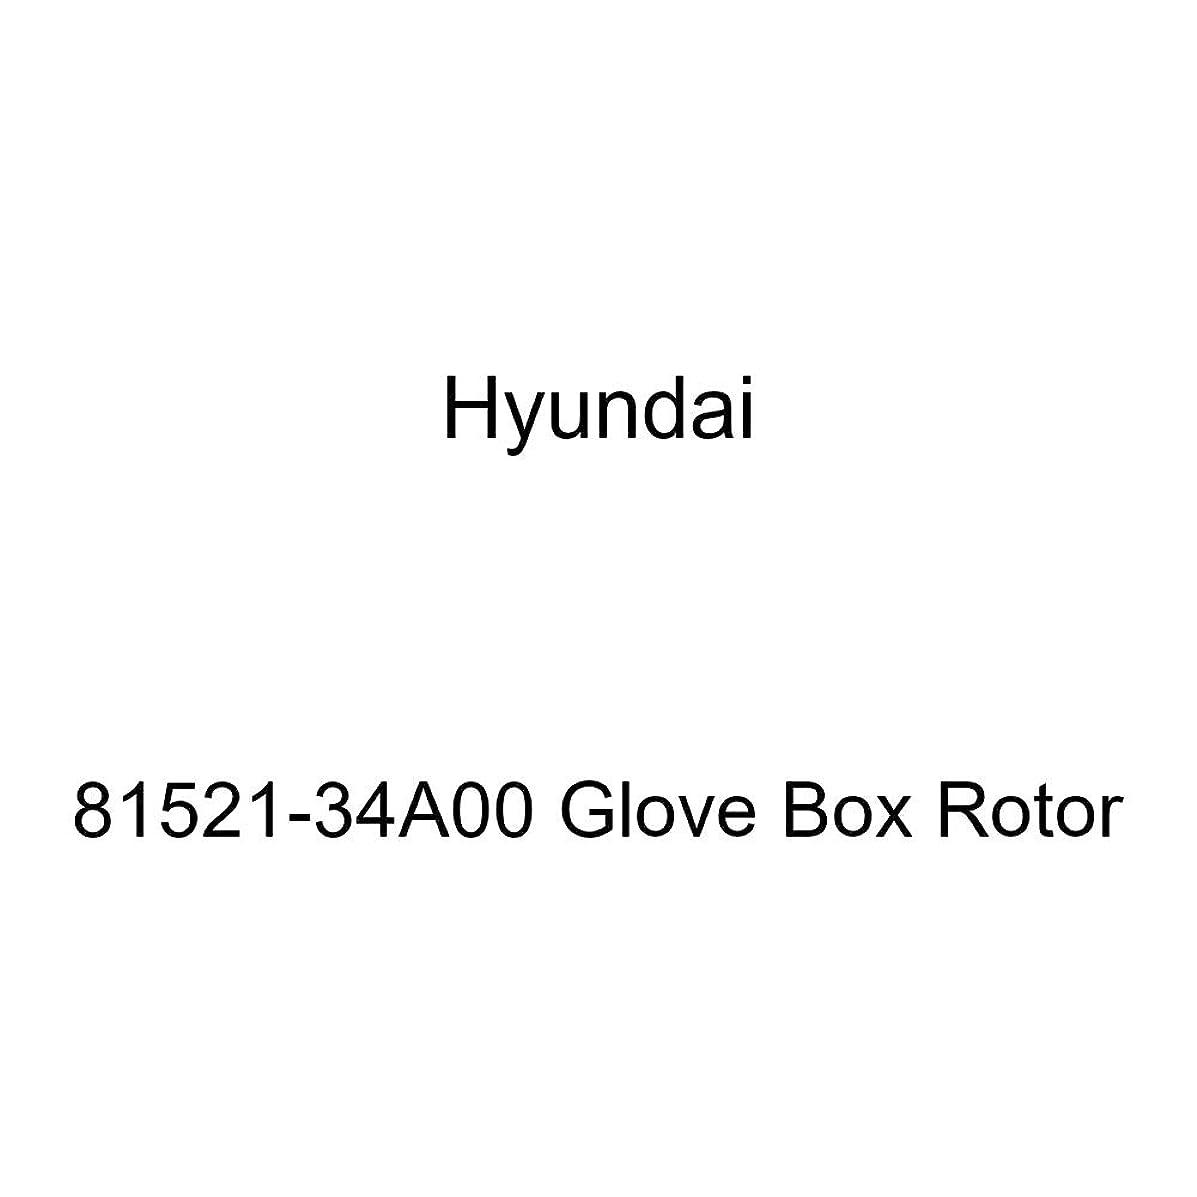 Genuine Hyundai 81521-34A00 Glove Box Rotor